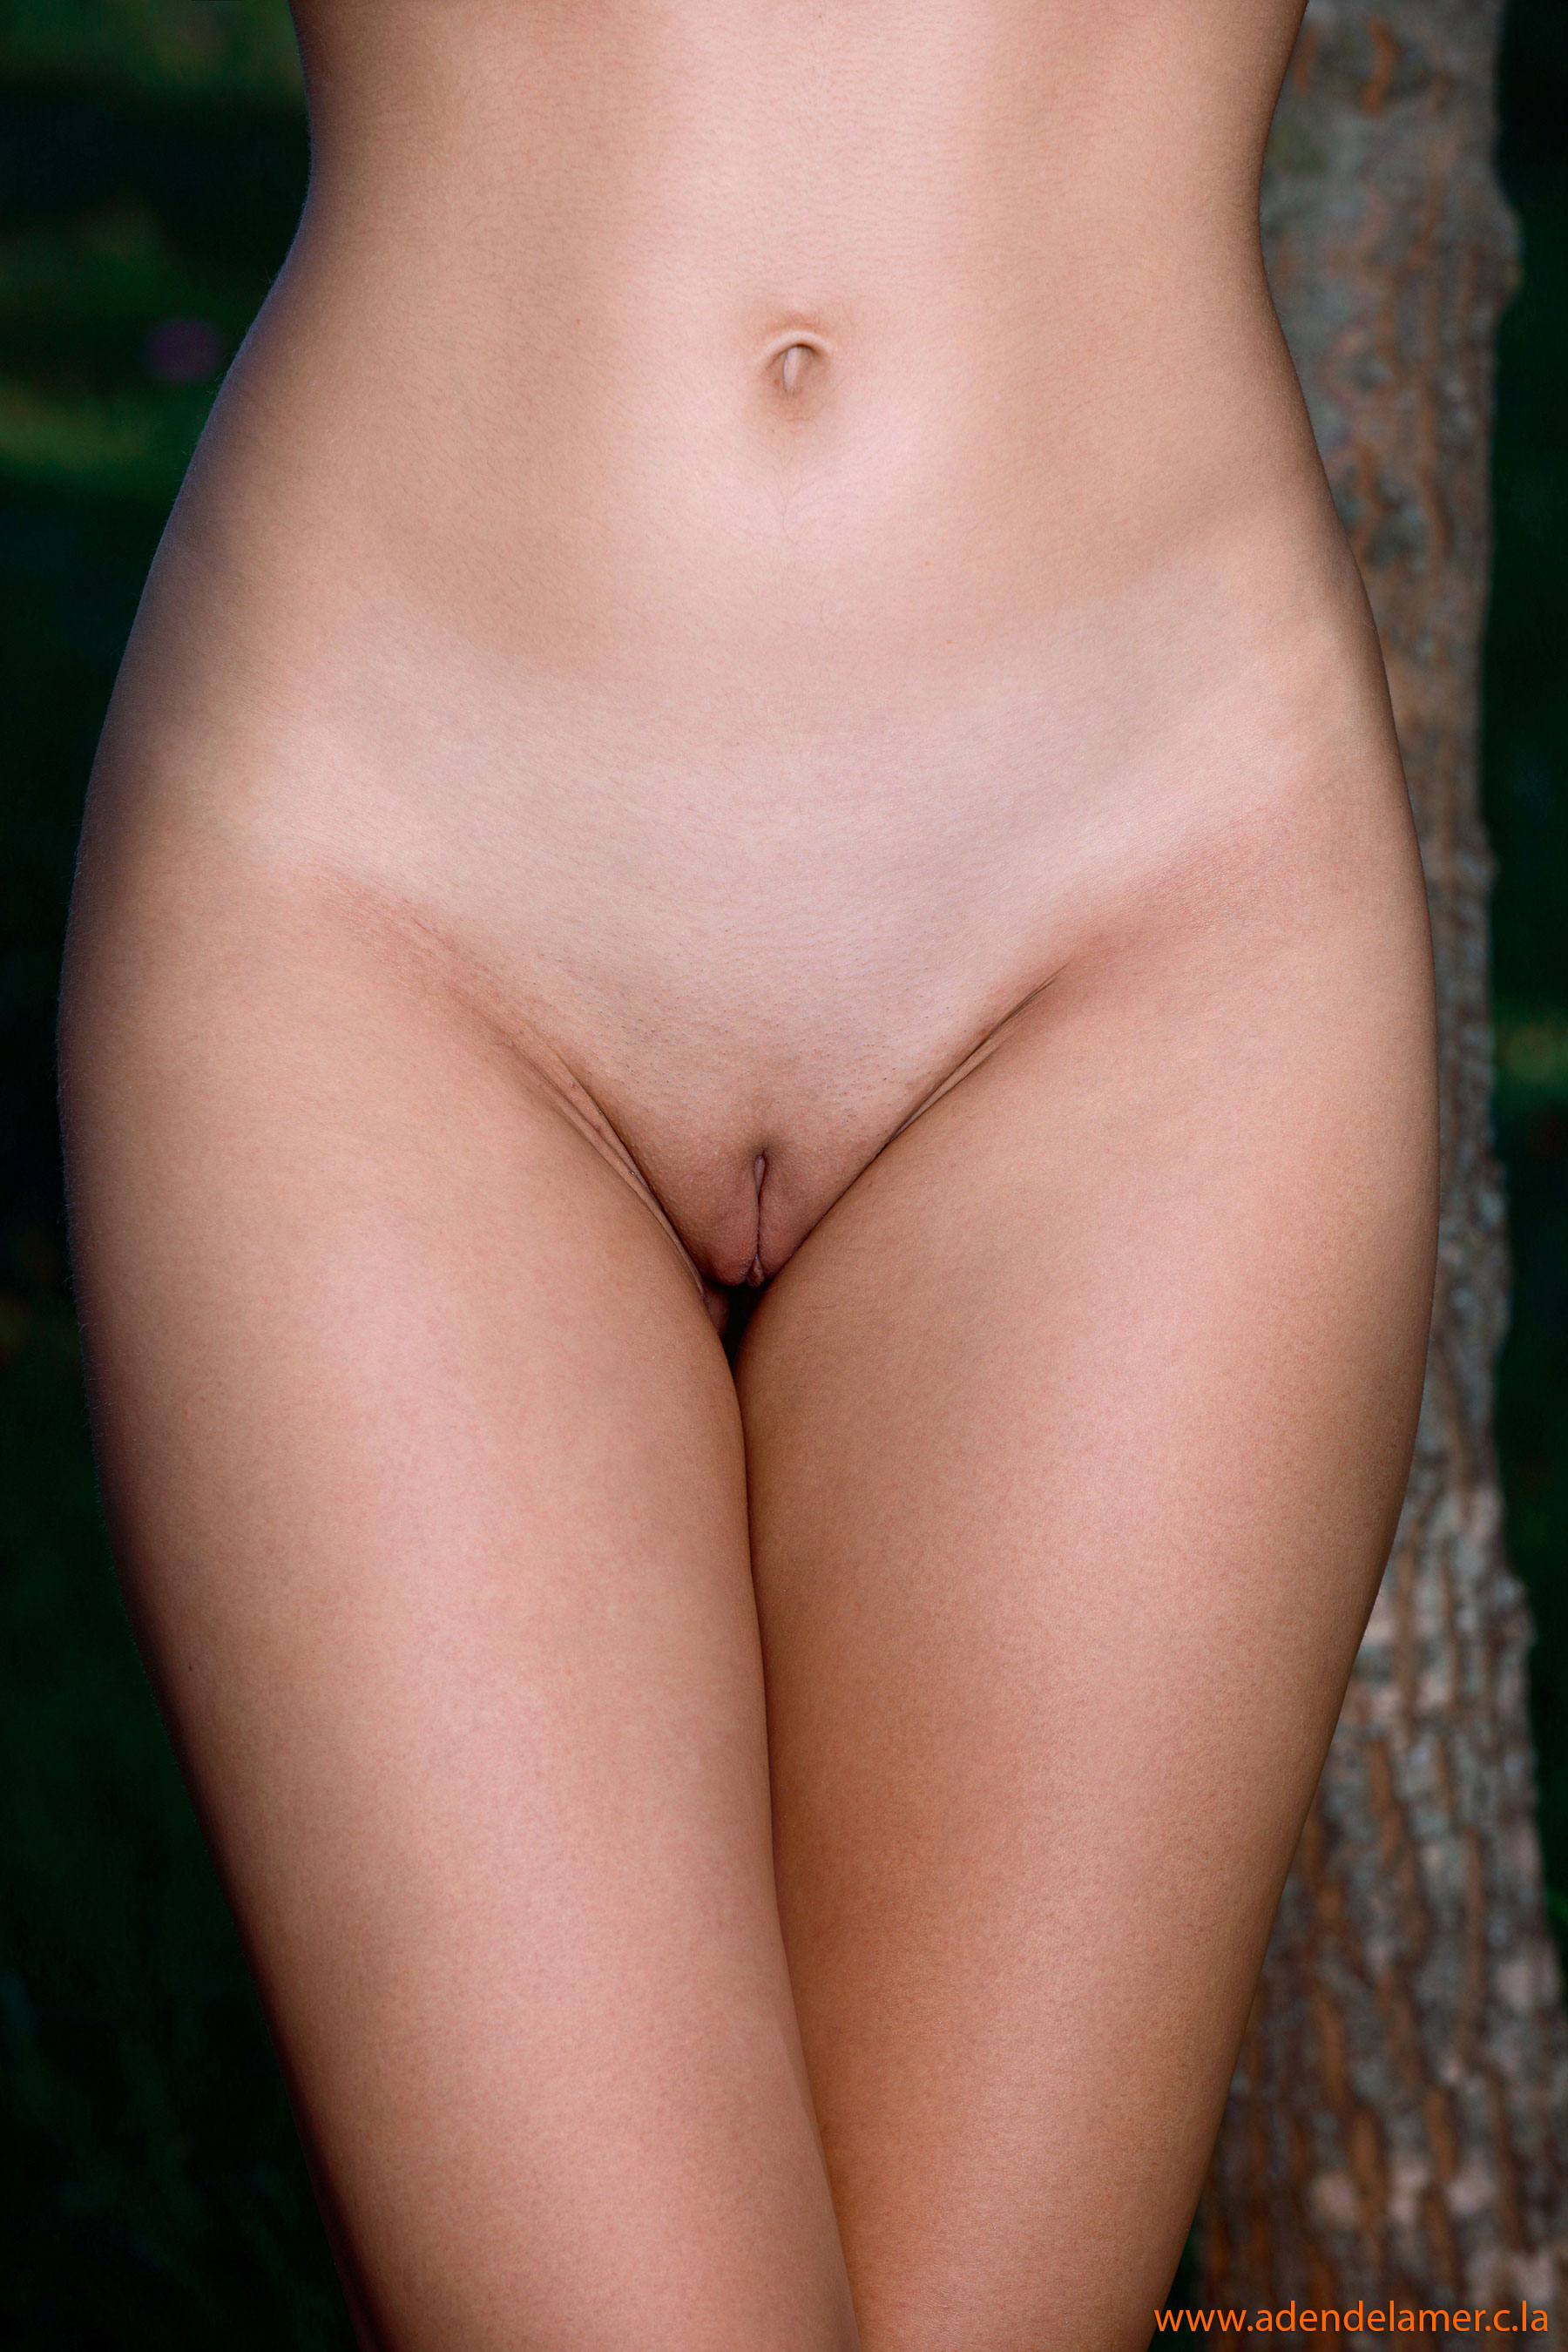 http://laurent.jamair.free.fr/Vrac2020/860/images/056.jpg